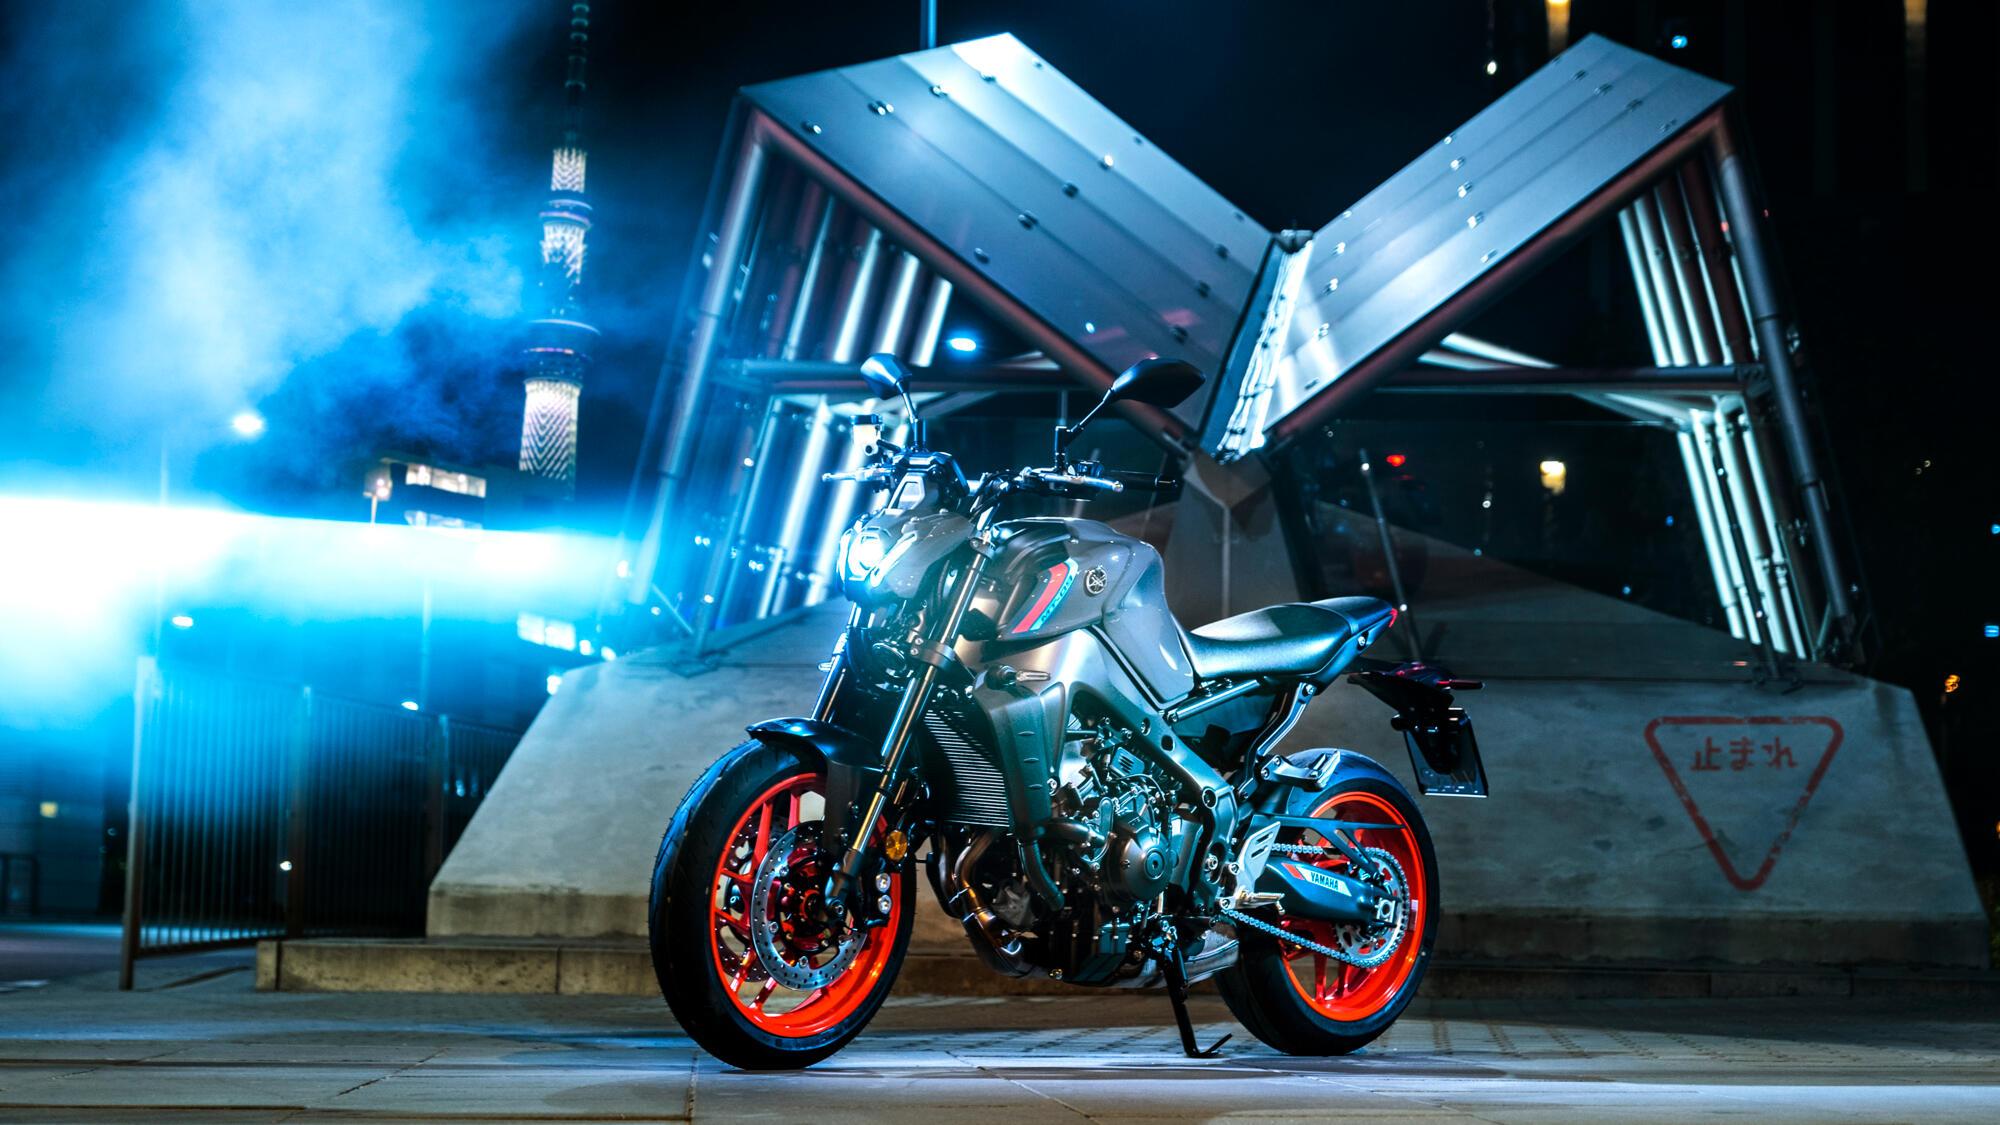 2021 Yamaha MT09 EU5 Storm Fluo